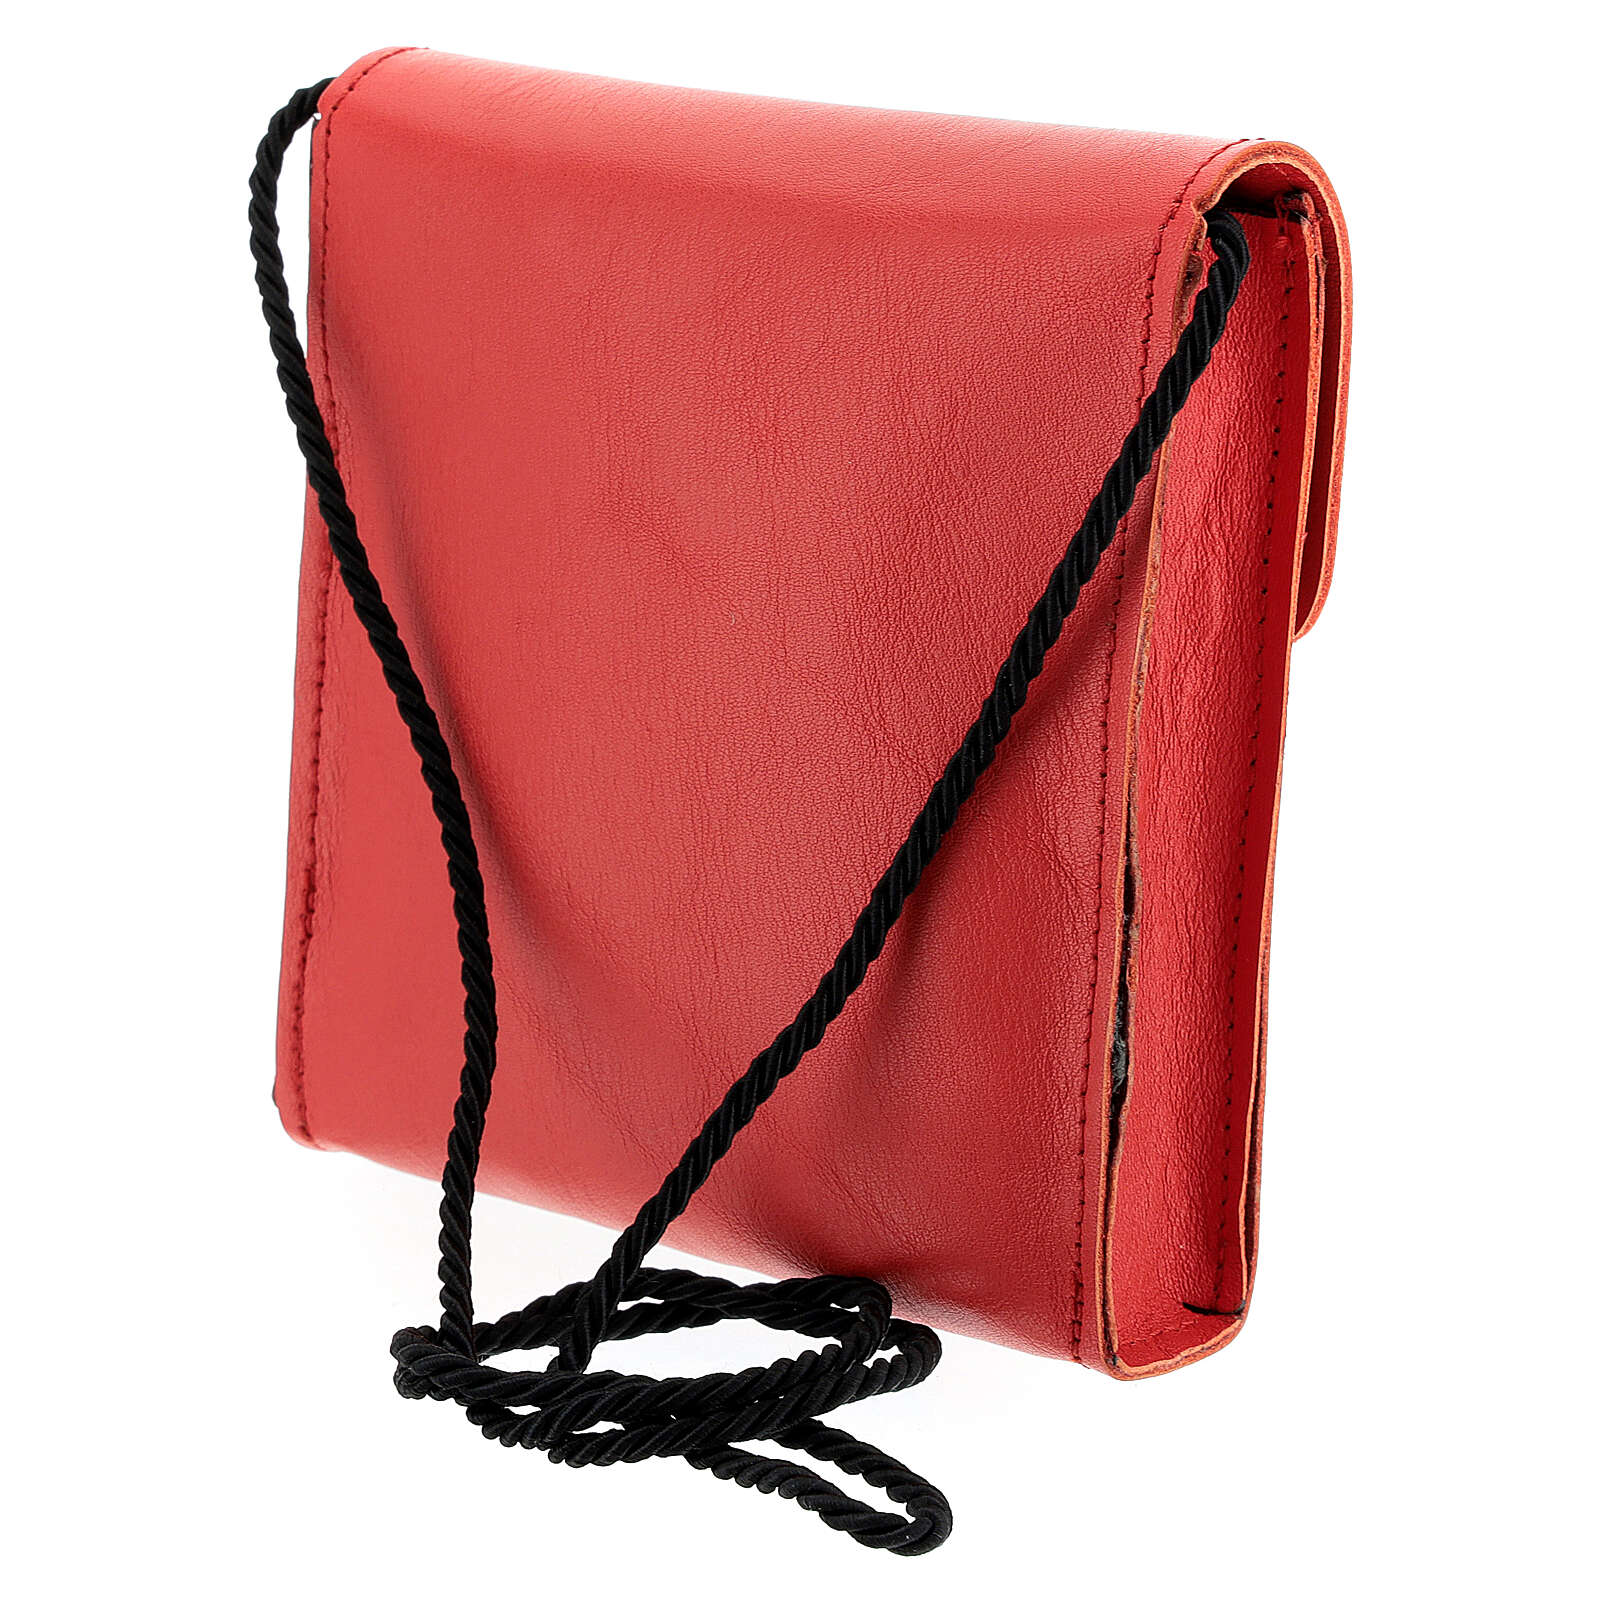 Rectangular paten burse 5x4 1/2 in real red leather 4